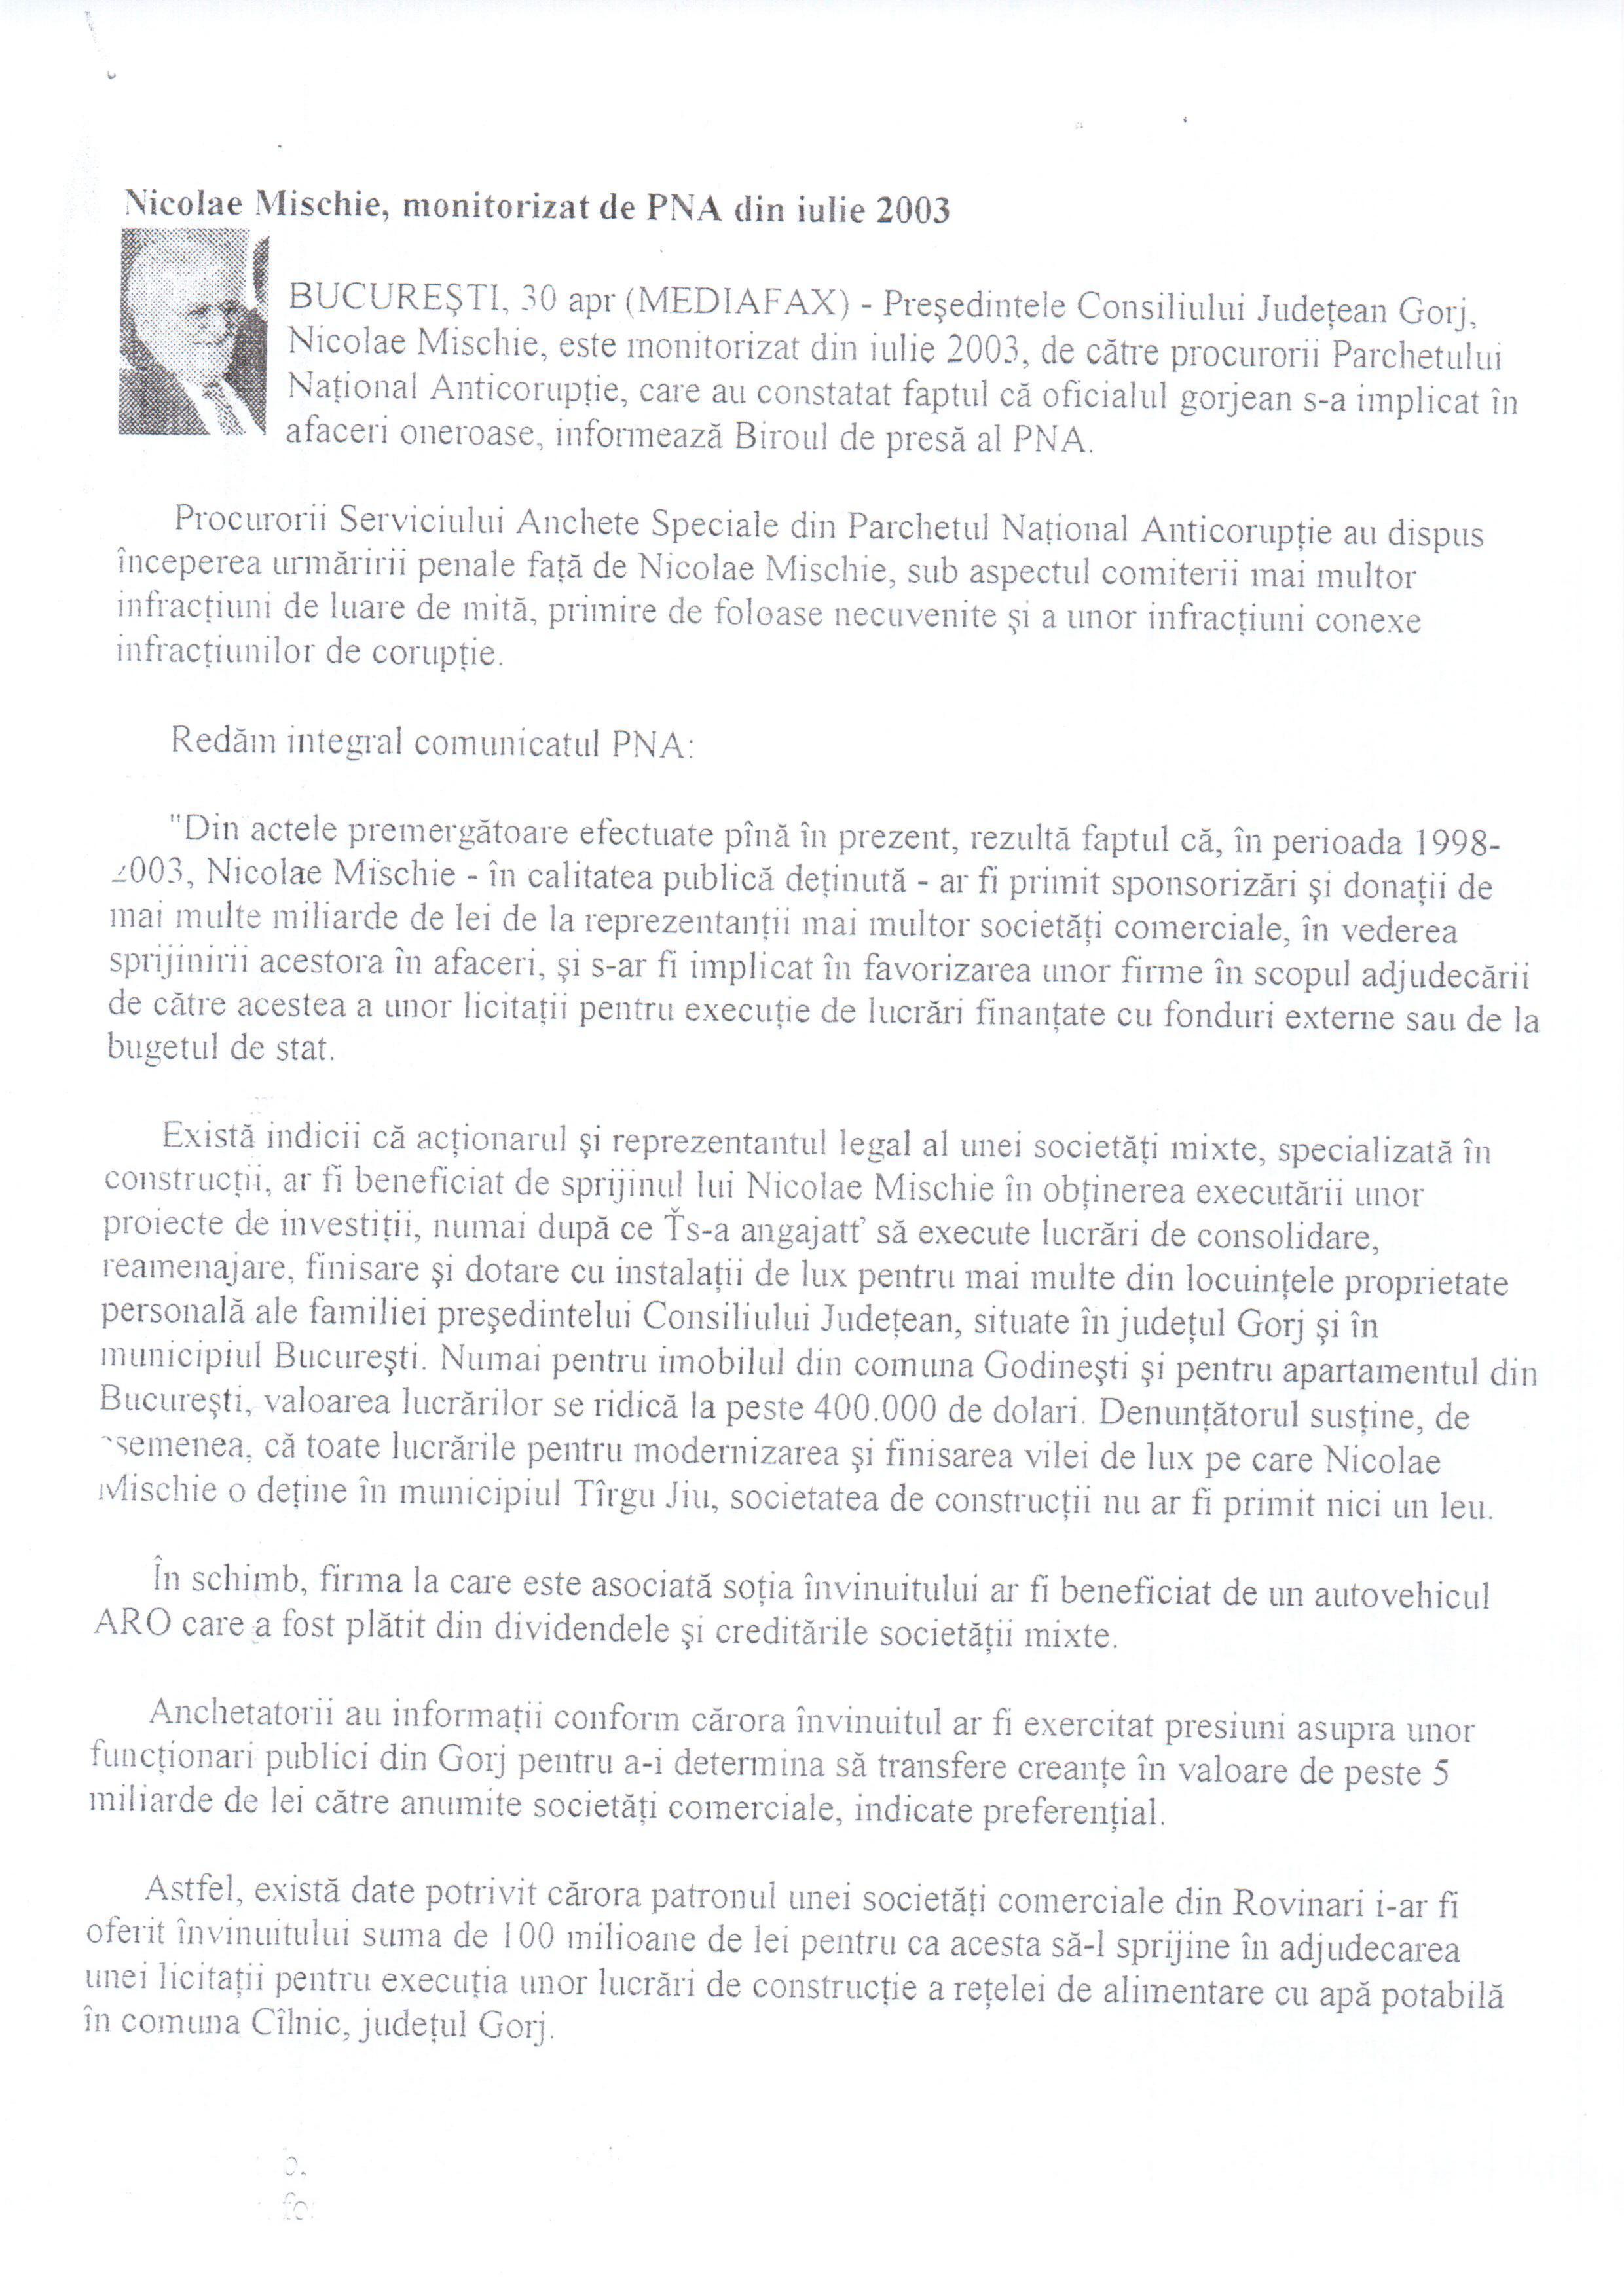 Nicolae Mischie, monitorizat de PNA din Iulie 2003